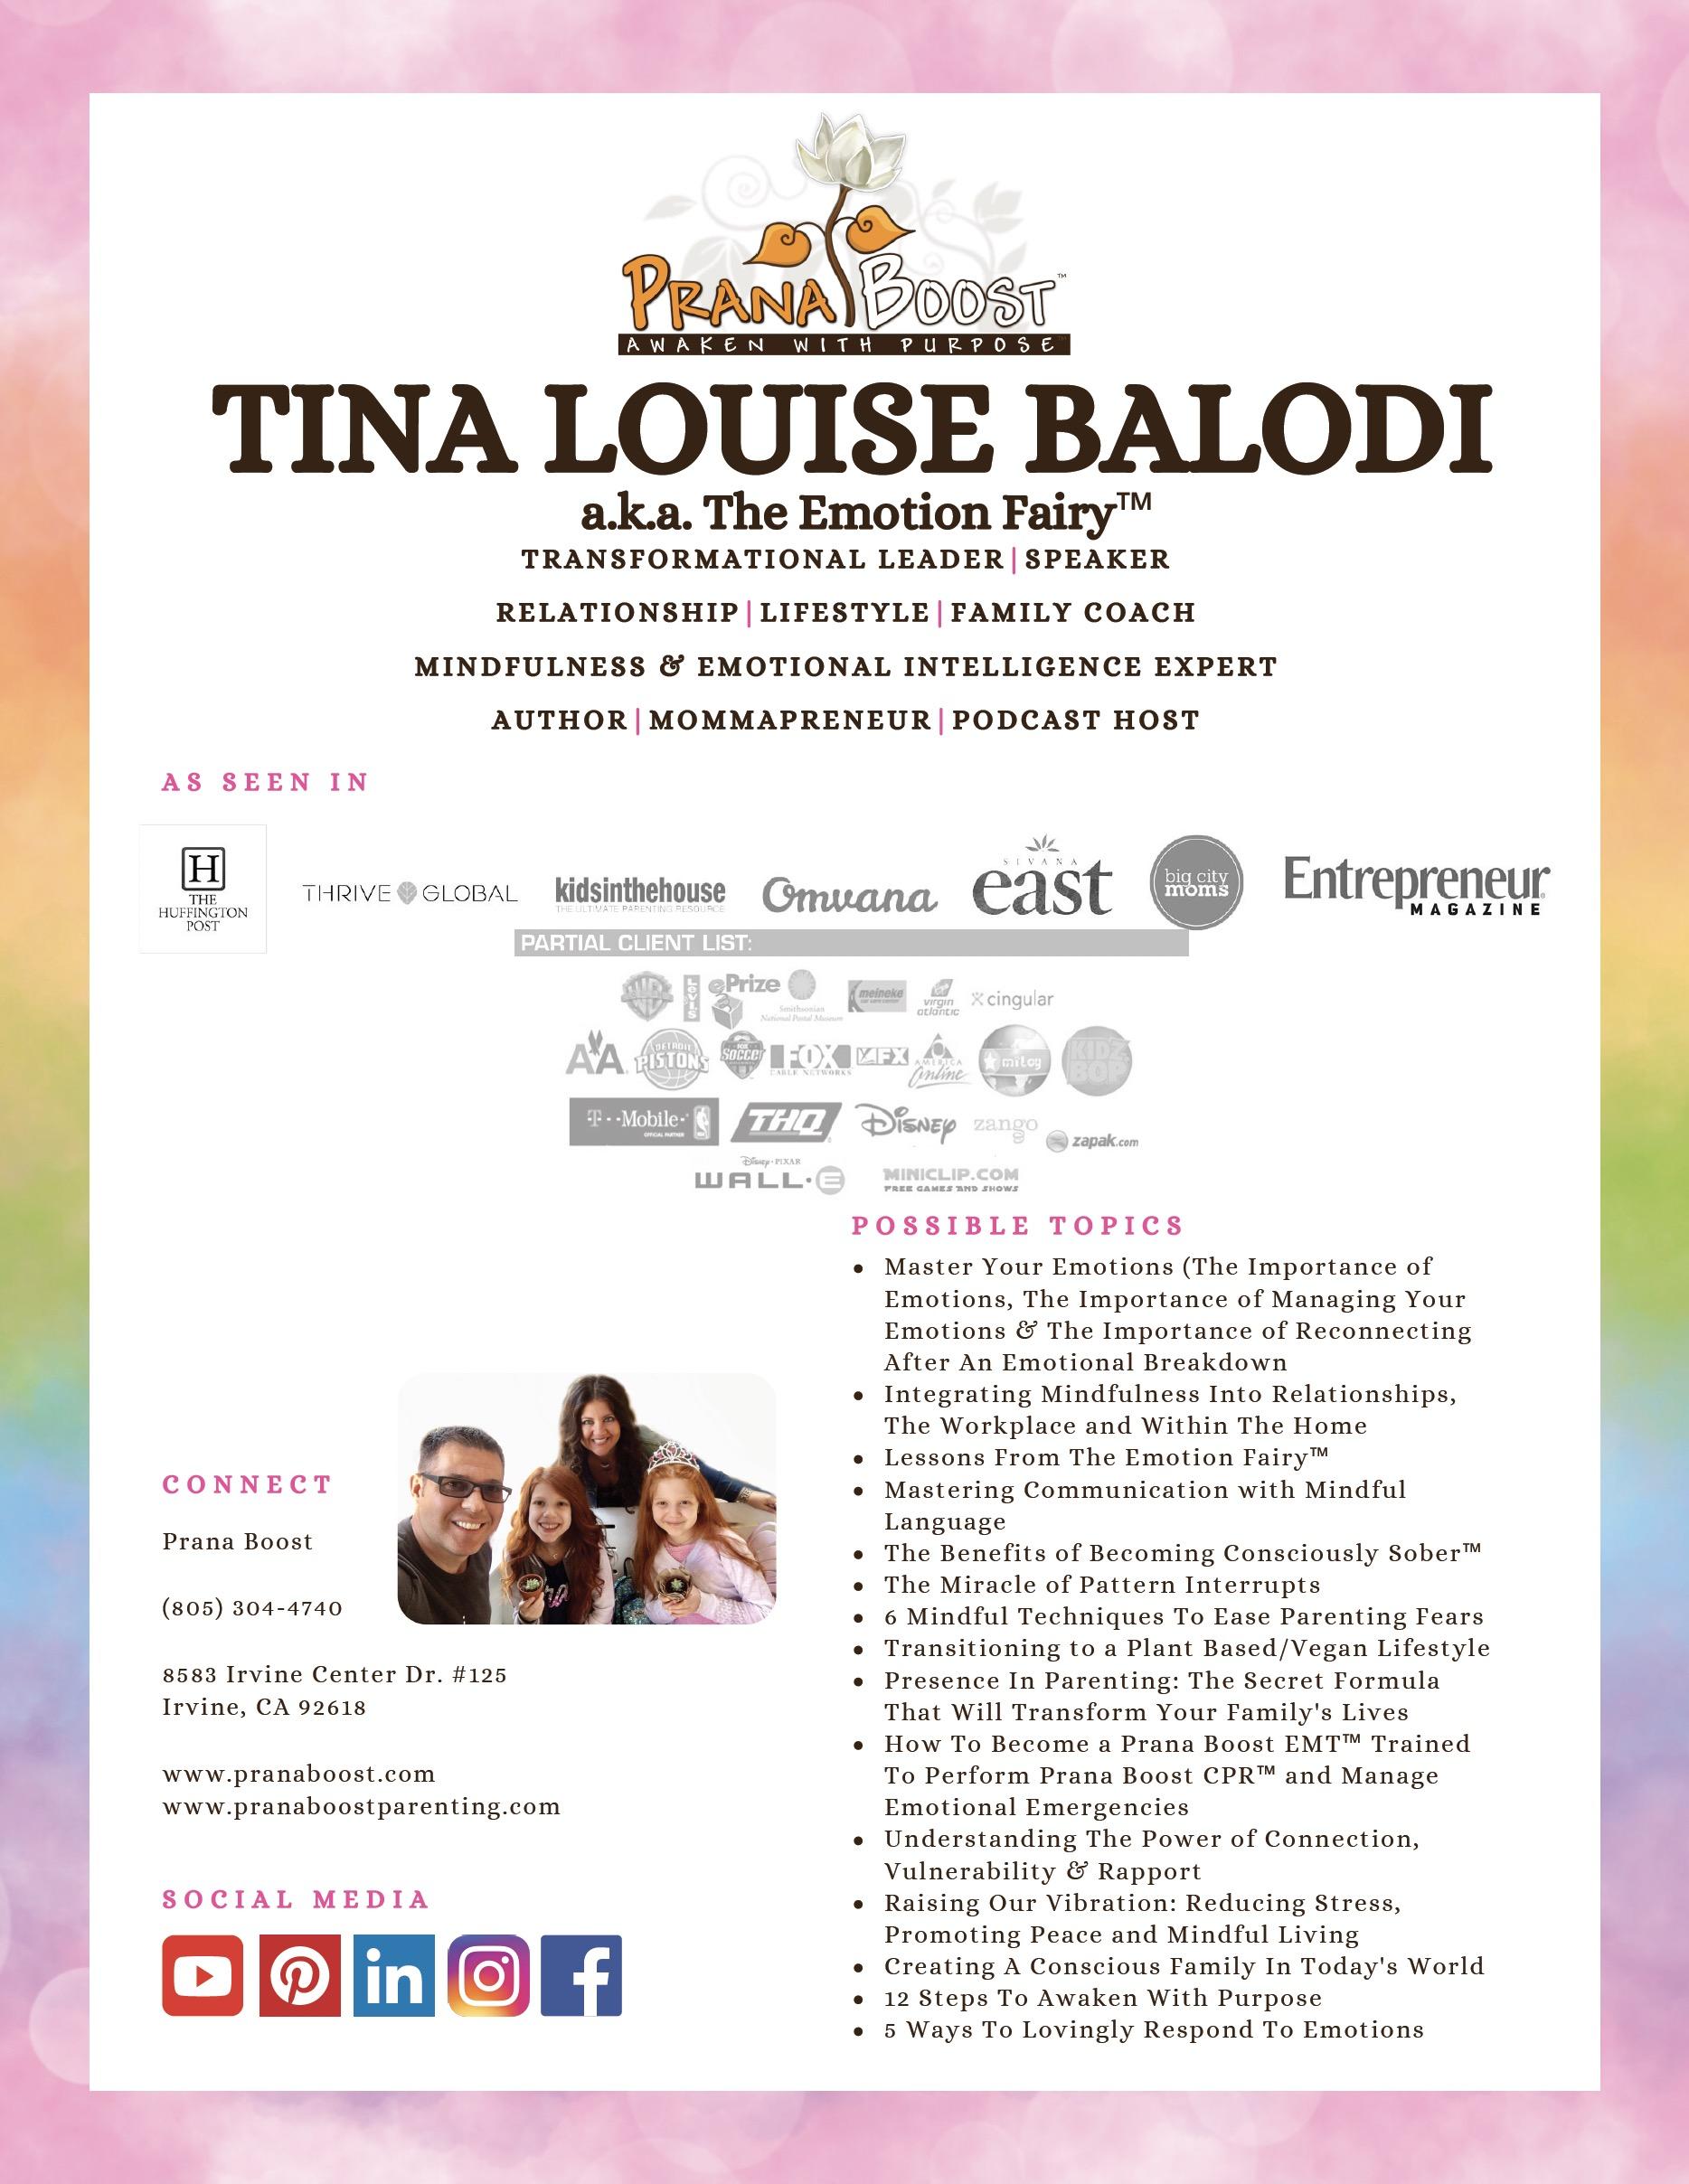 Tina Louise Balodi